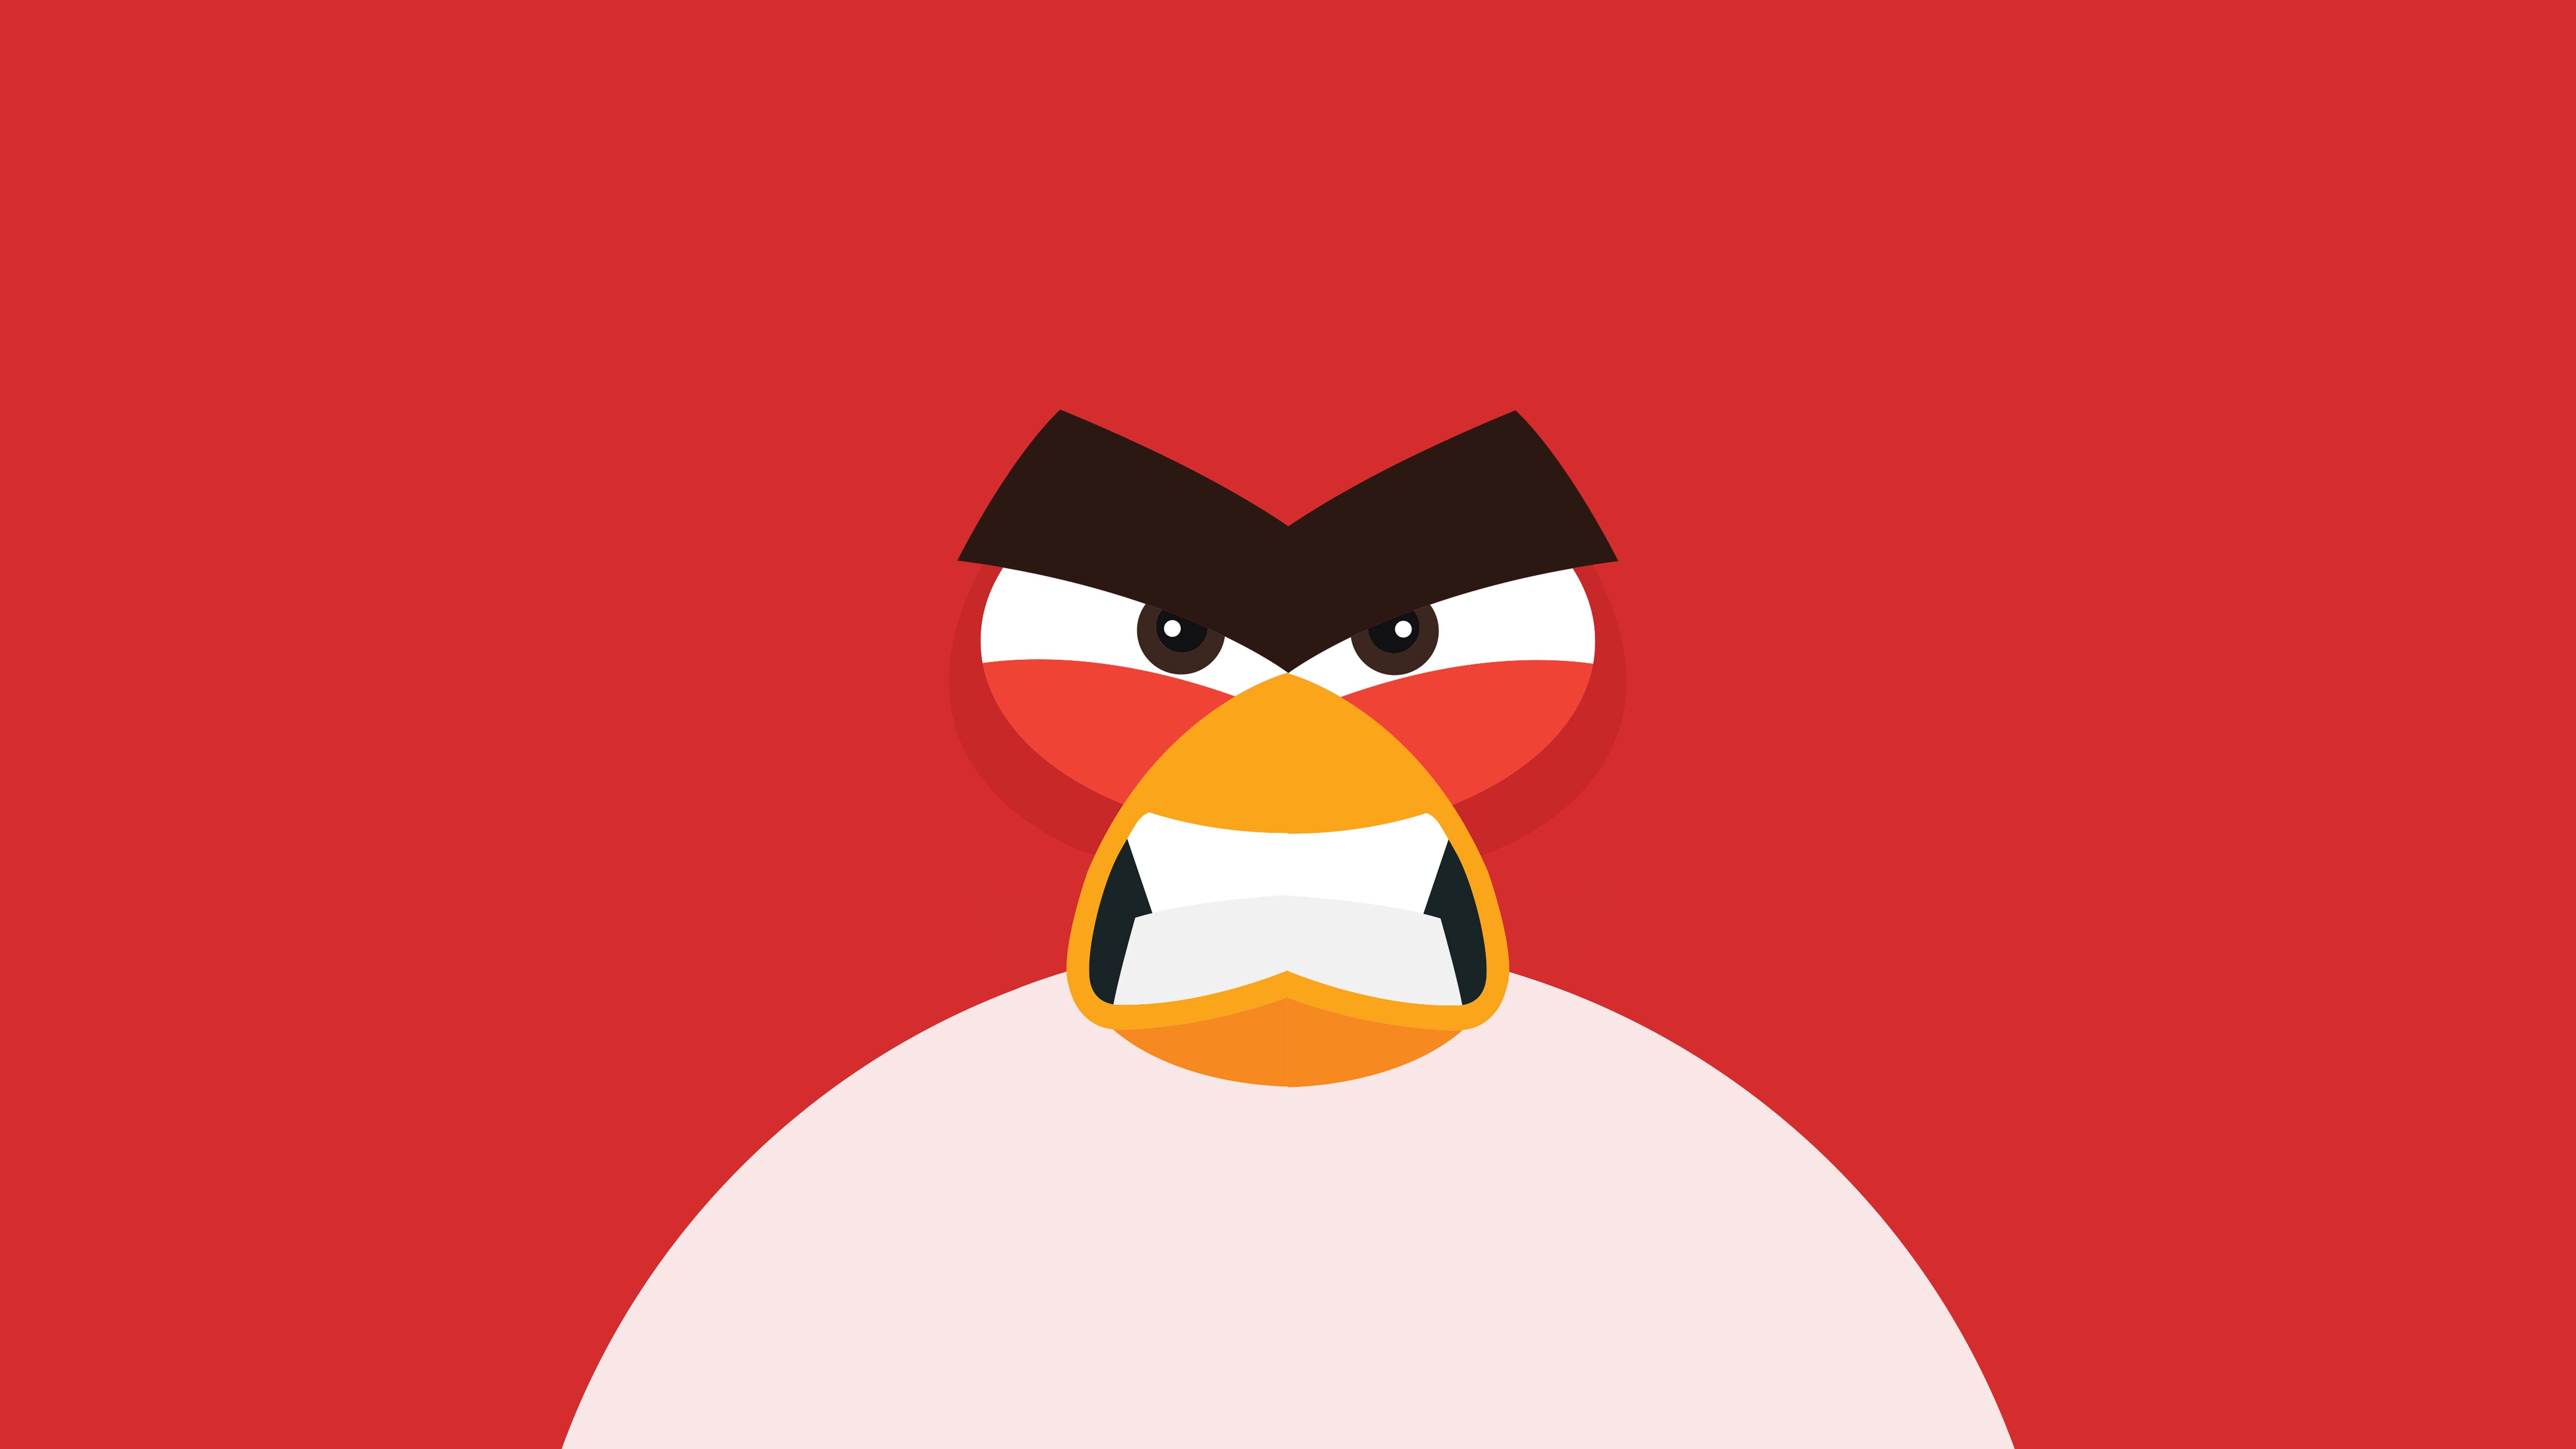 Fondos de pantalla Angry Bird Minimalista